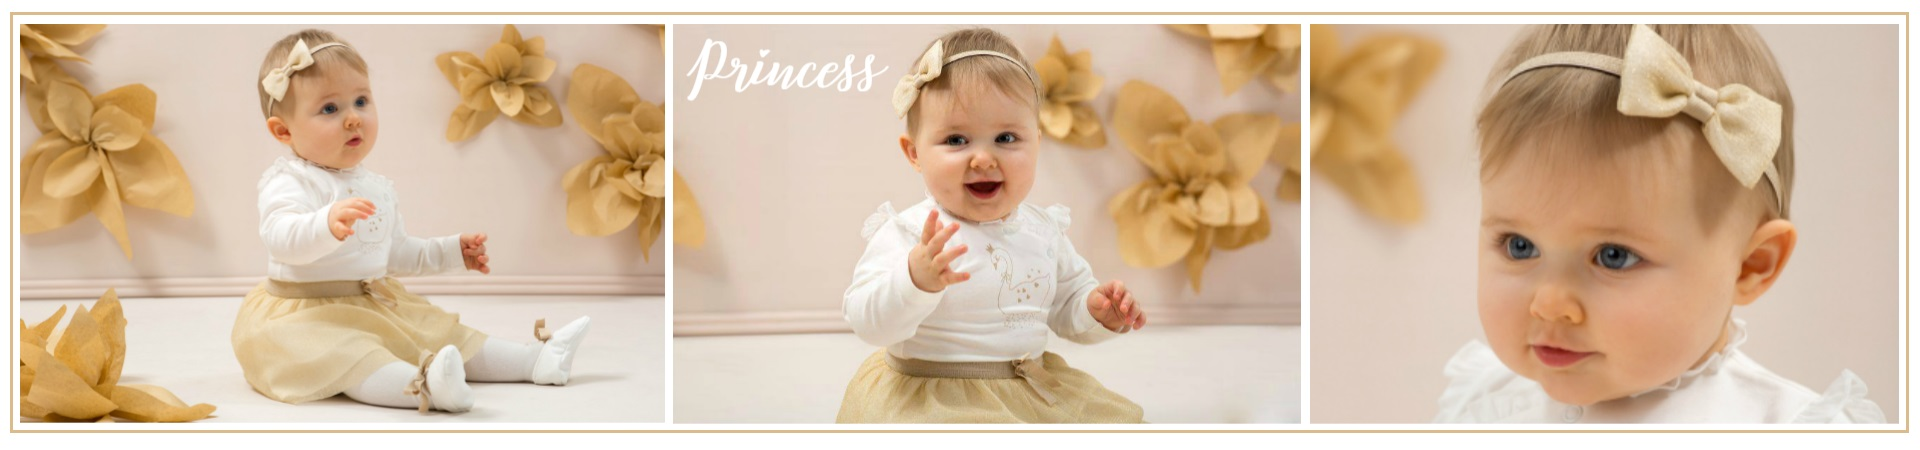 Oblačila za punčke - kolekcija Princess